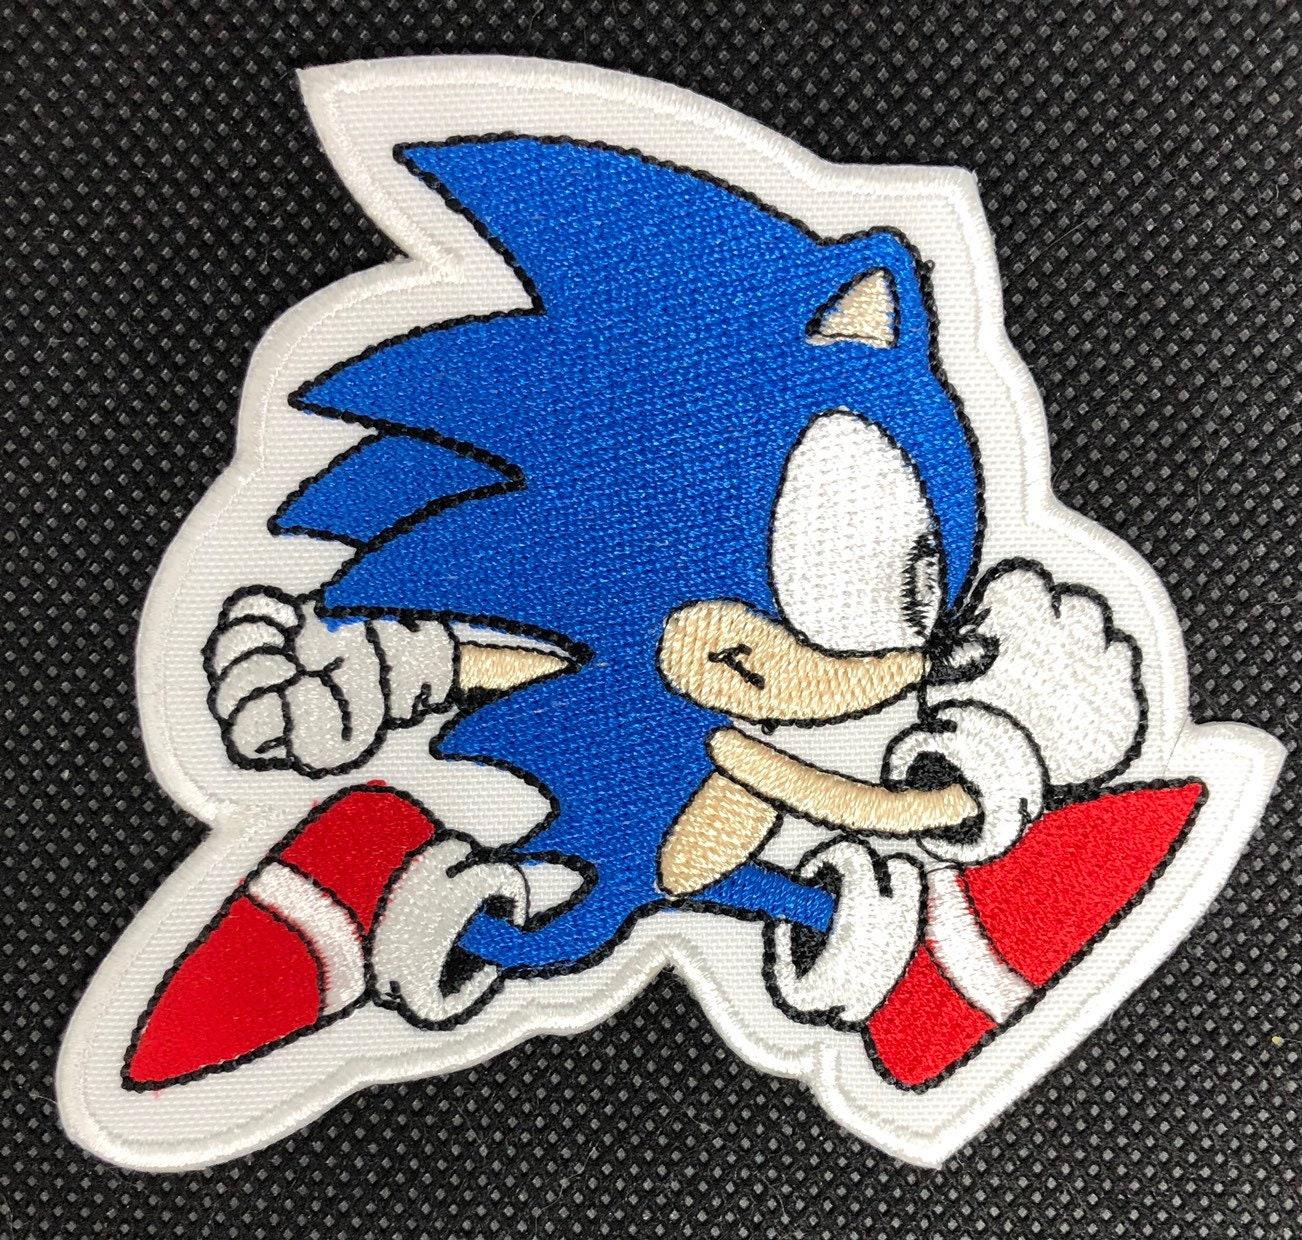 sonic the hedgehog cartoon running